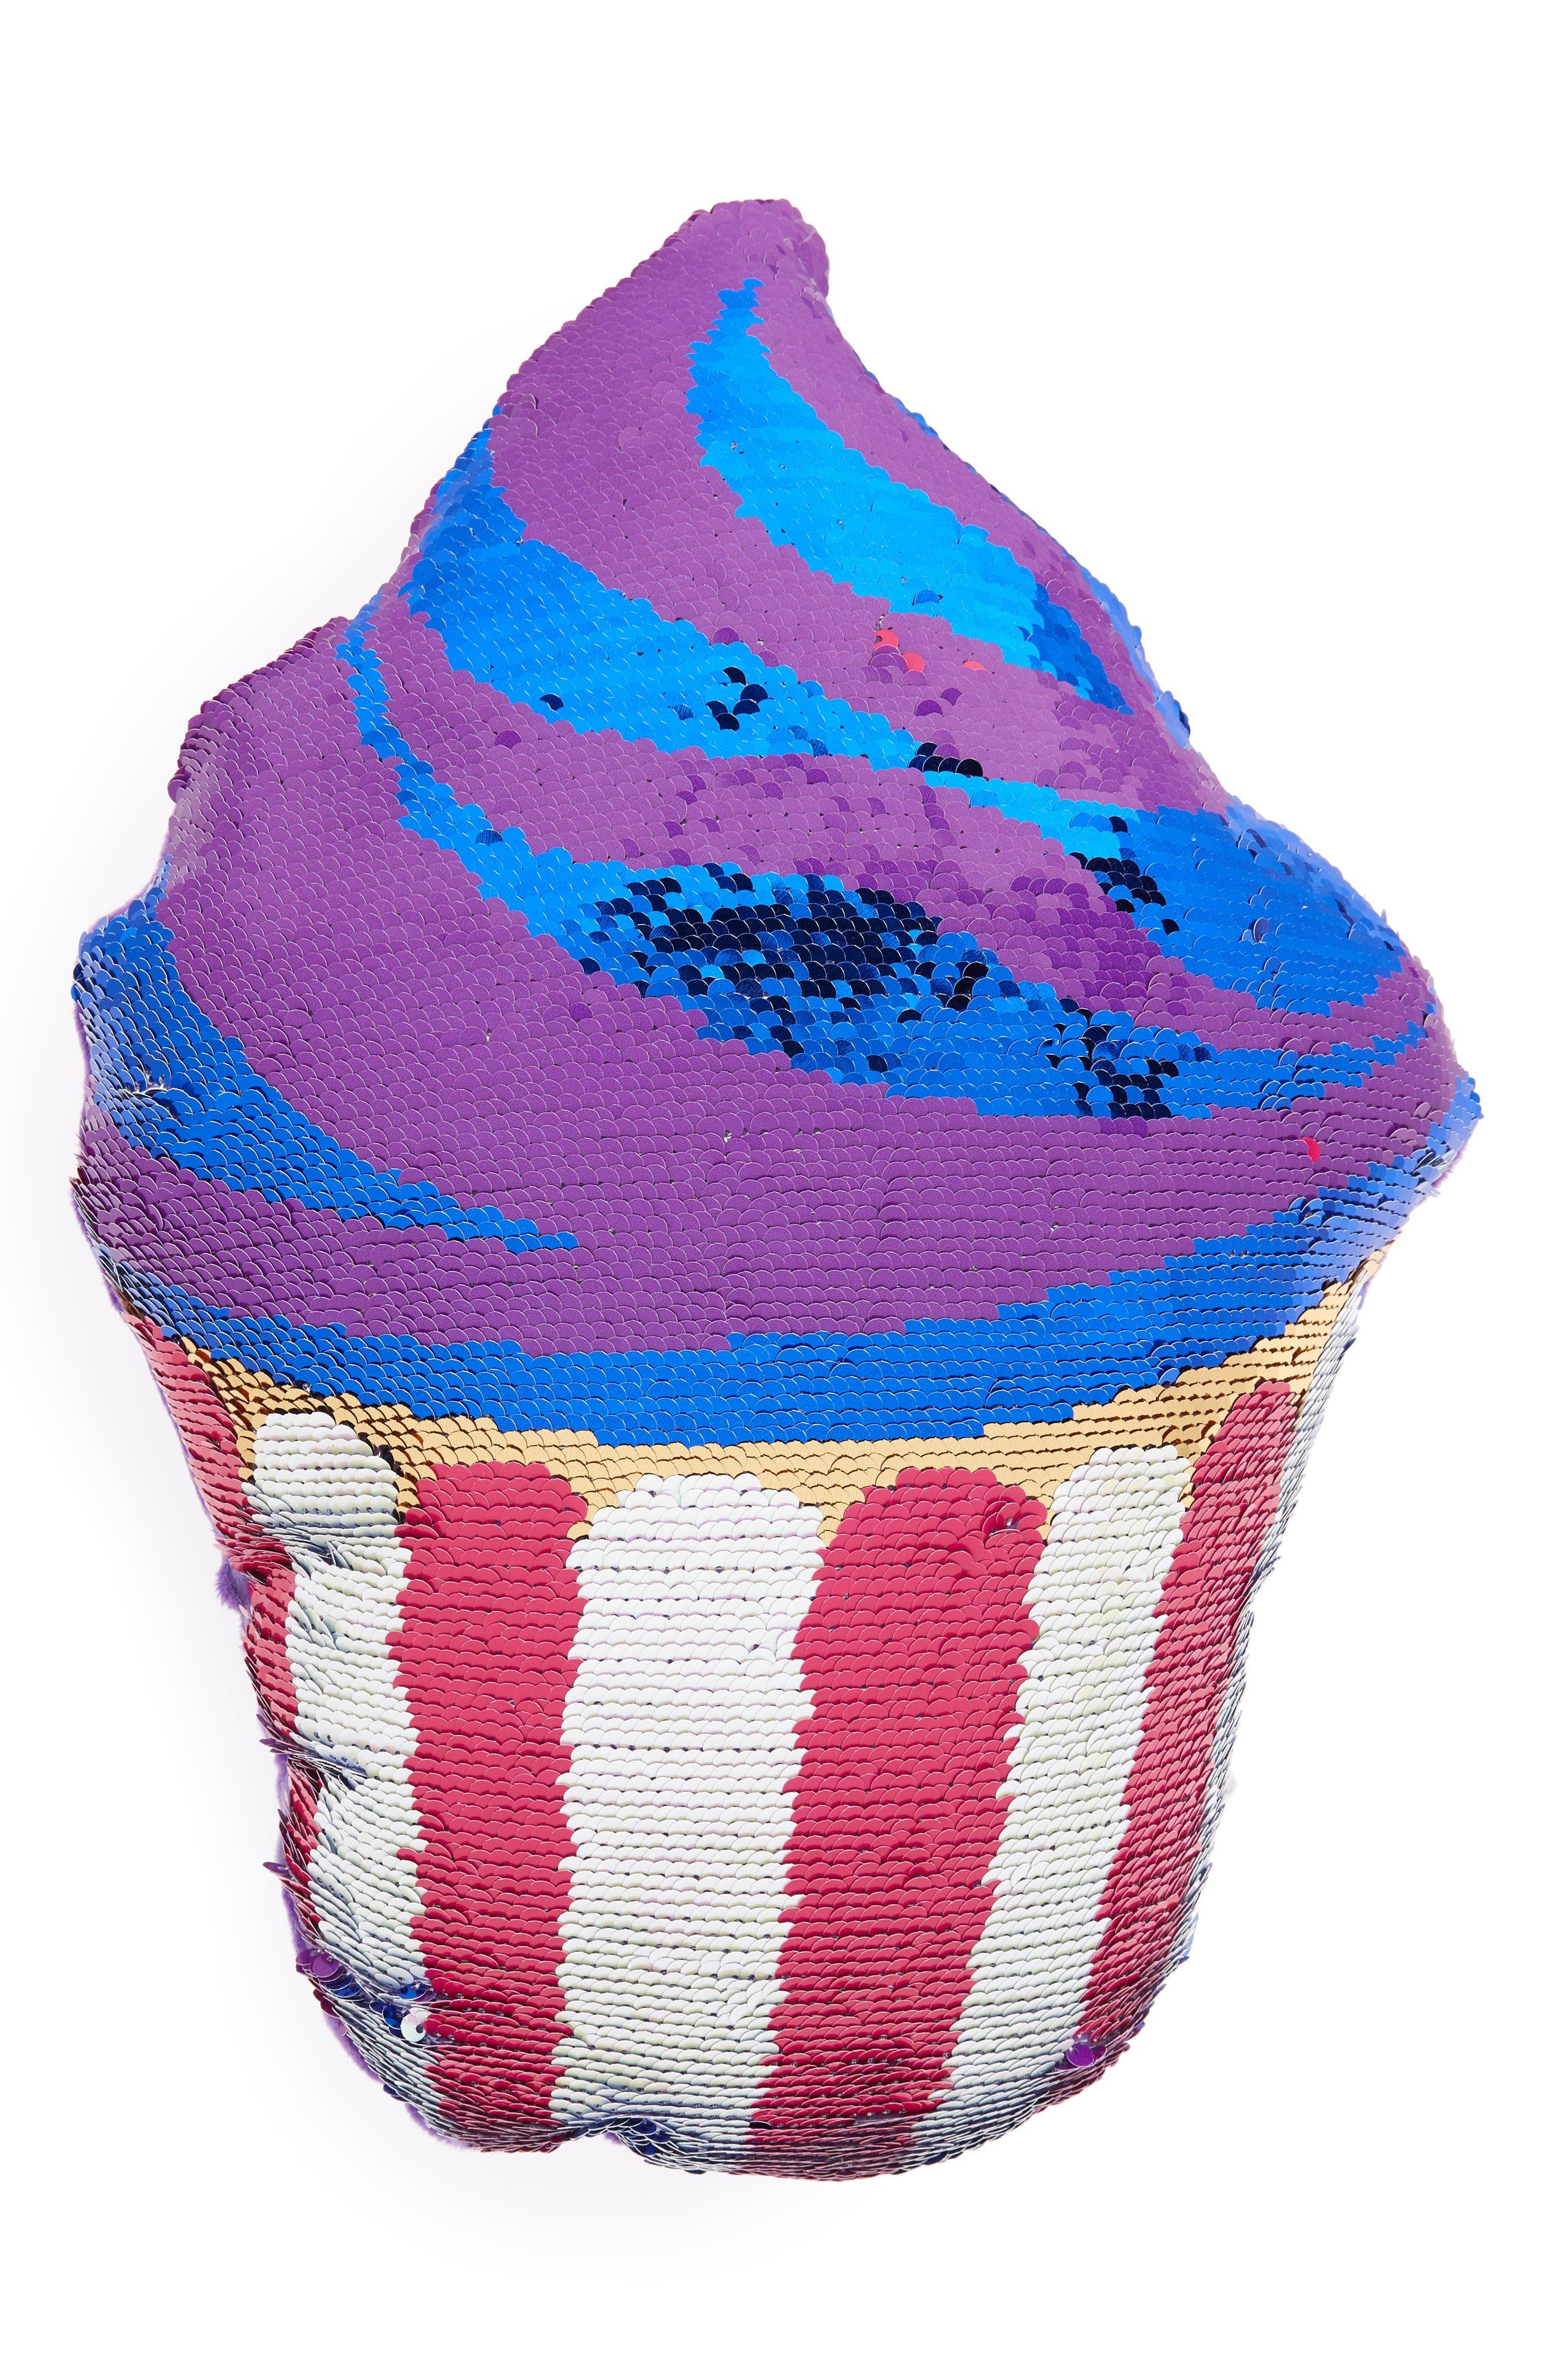 Flip Sequin Cupcake Pillow,                             Alternate thumbnail 4, color,                             960